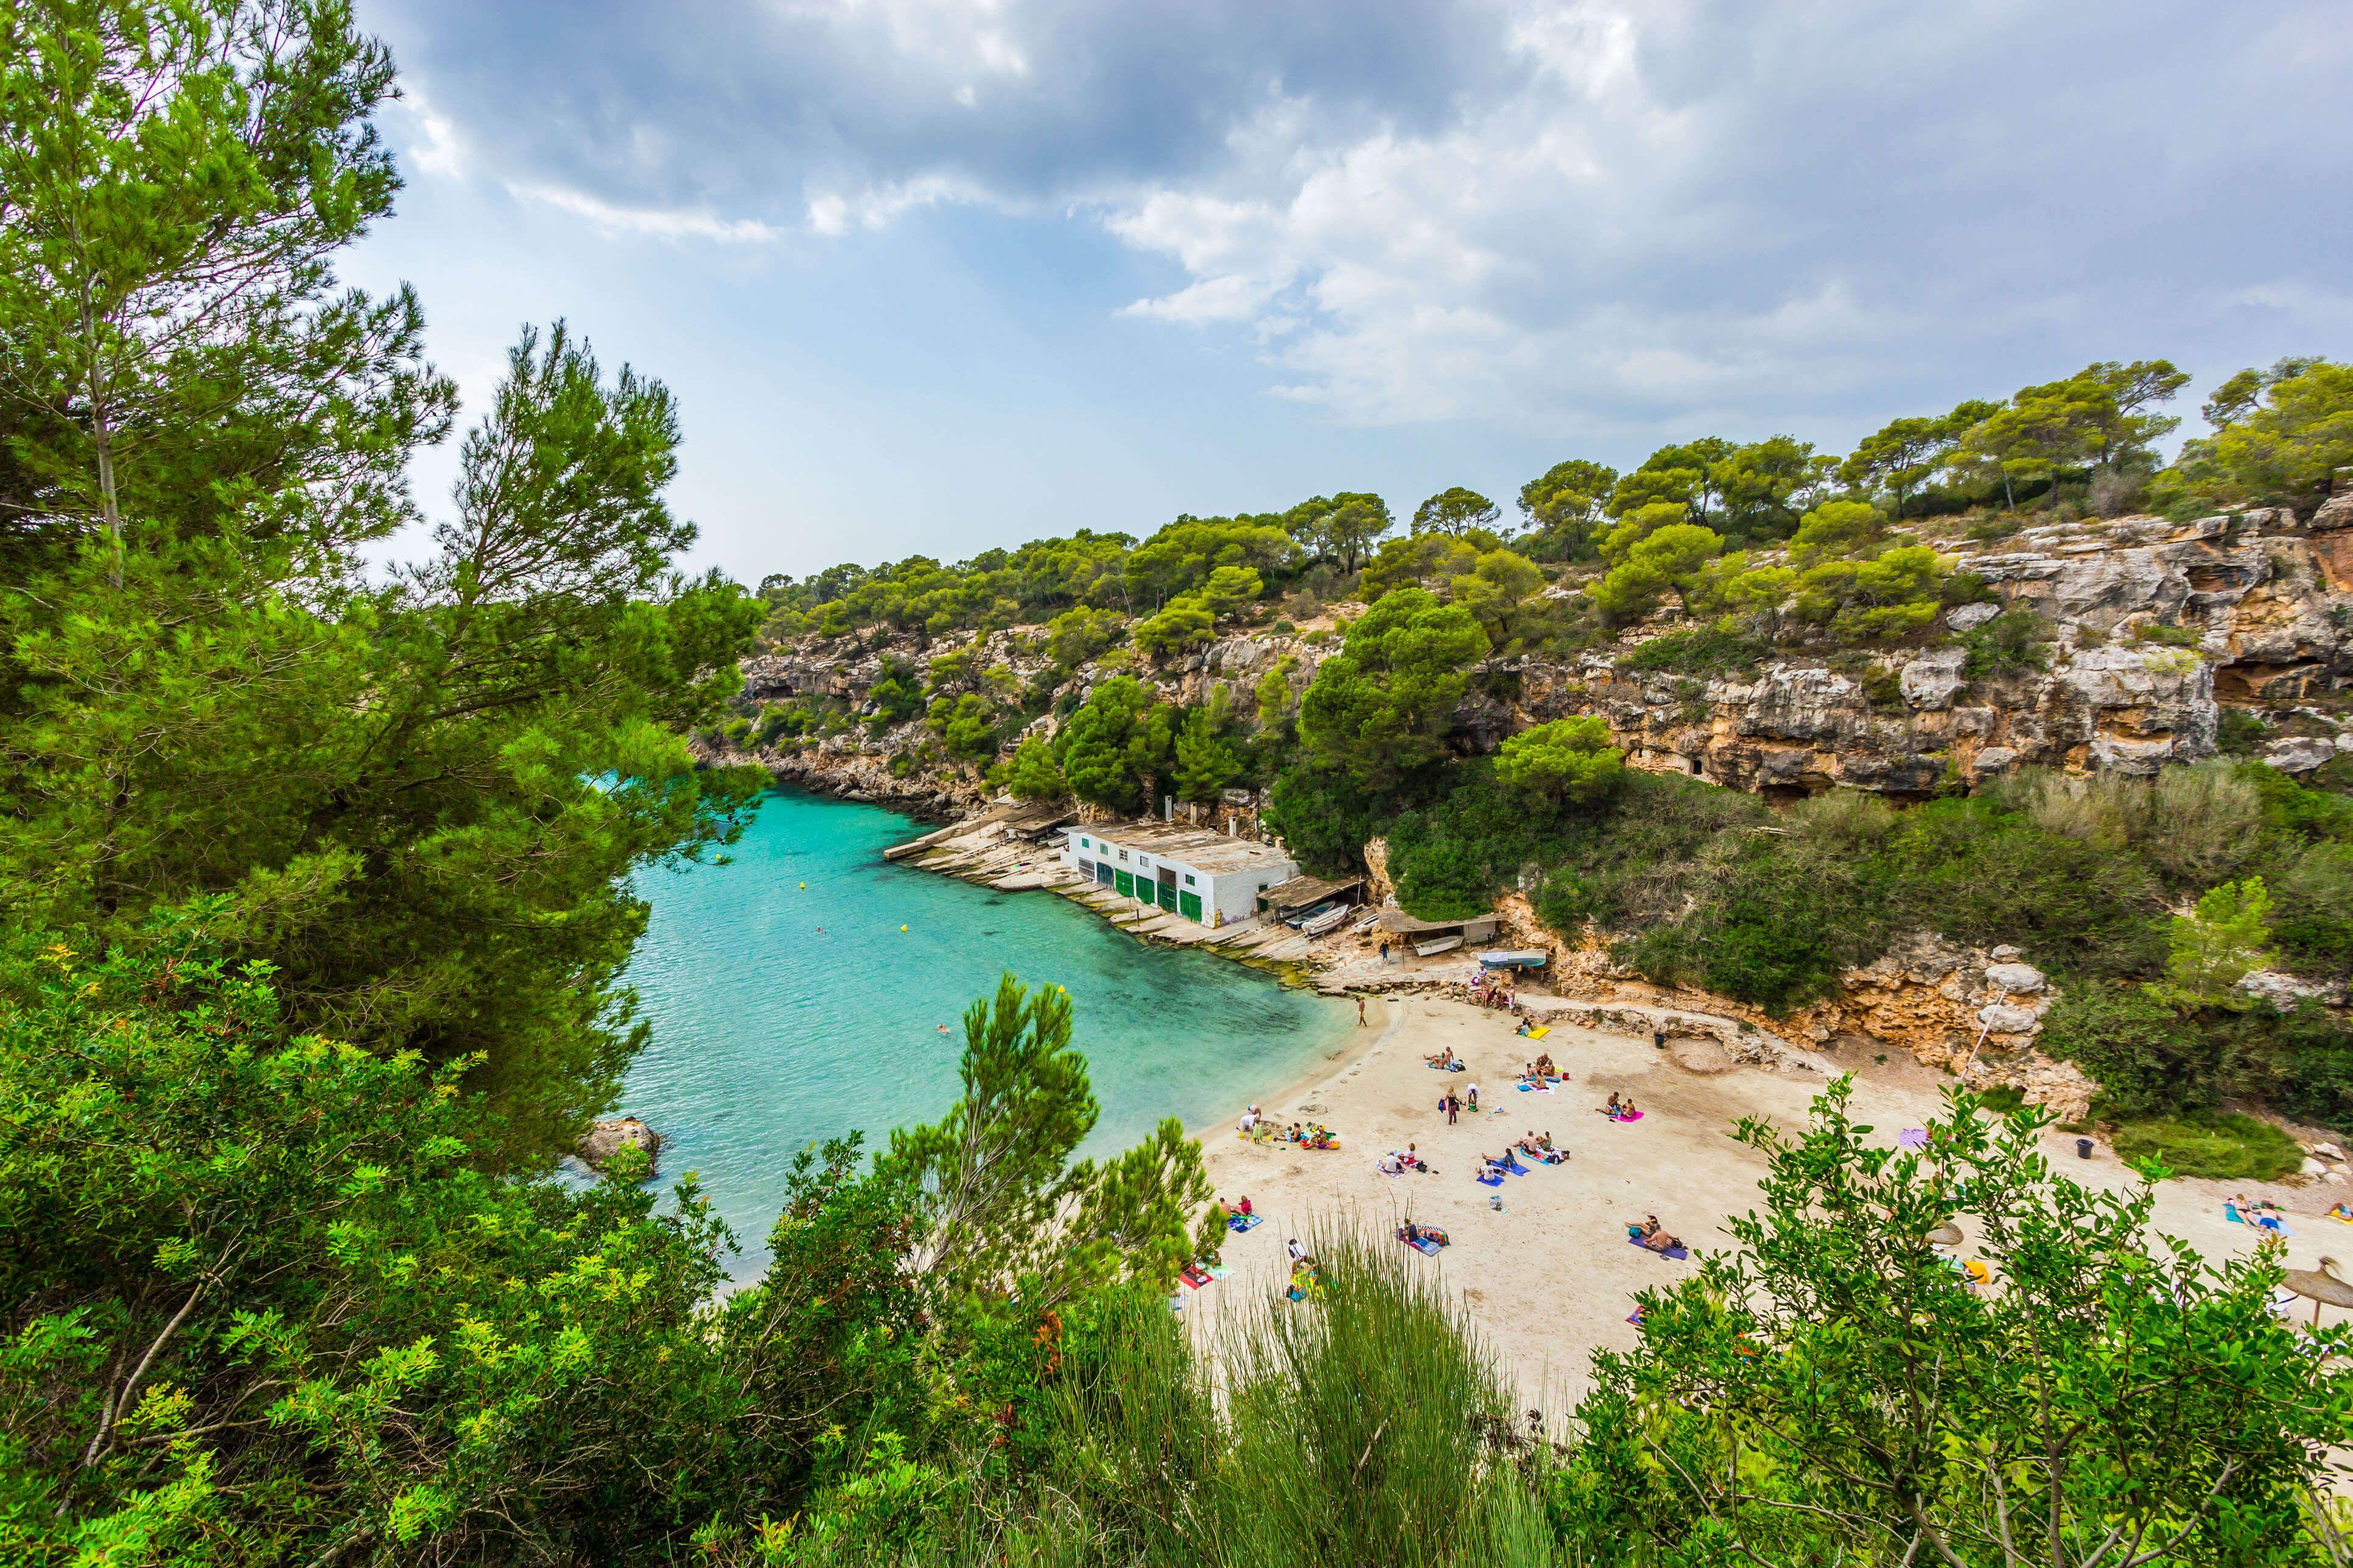 Cala Pi Steilkuste Trifft Traumstrand Urlaub Strande Mallorca